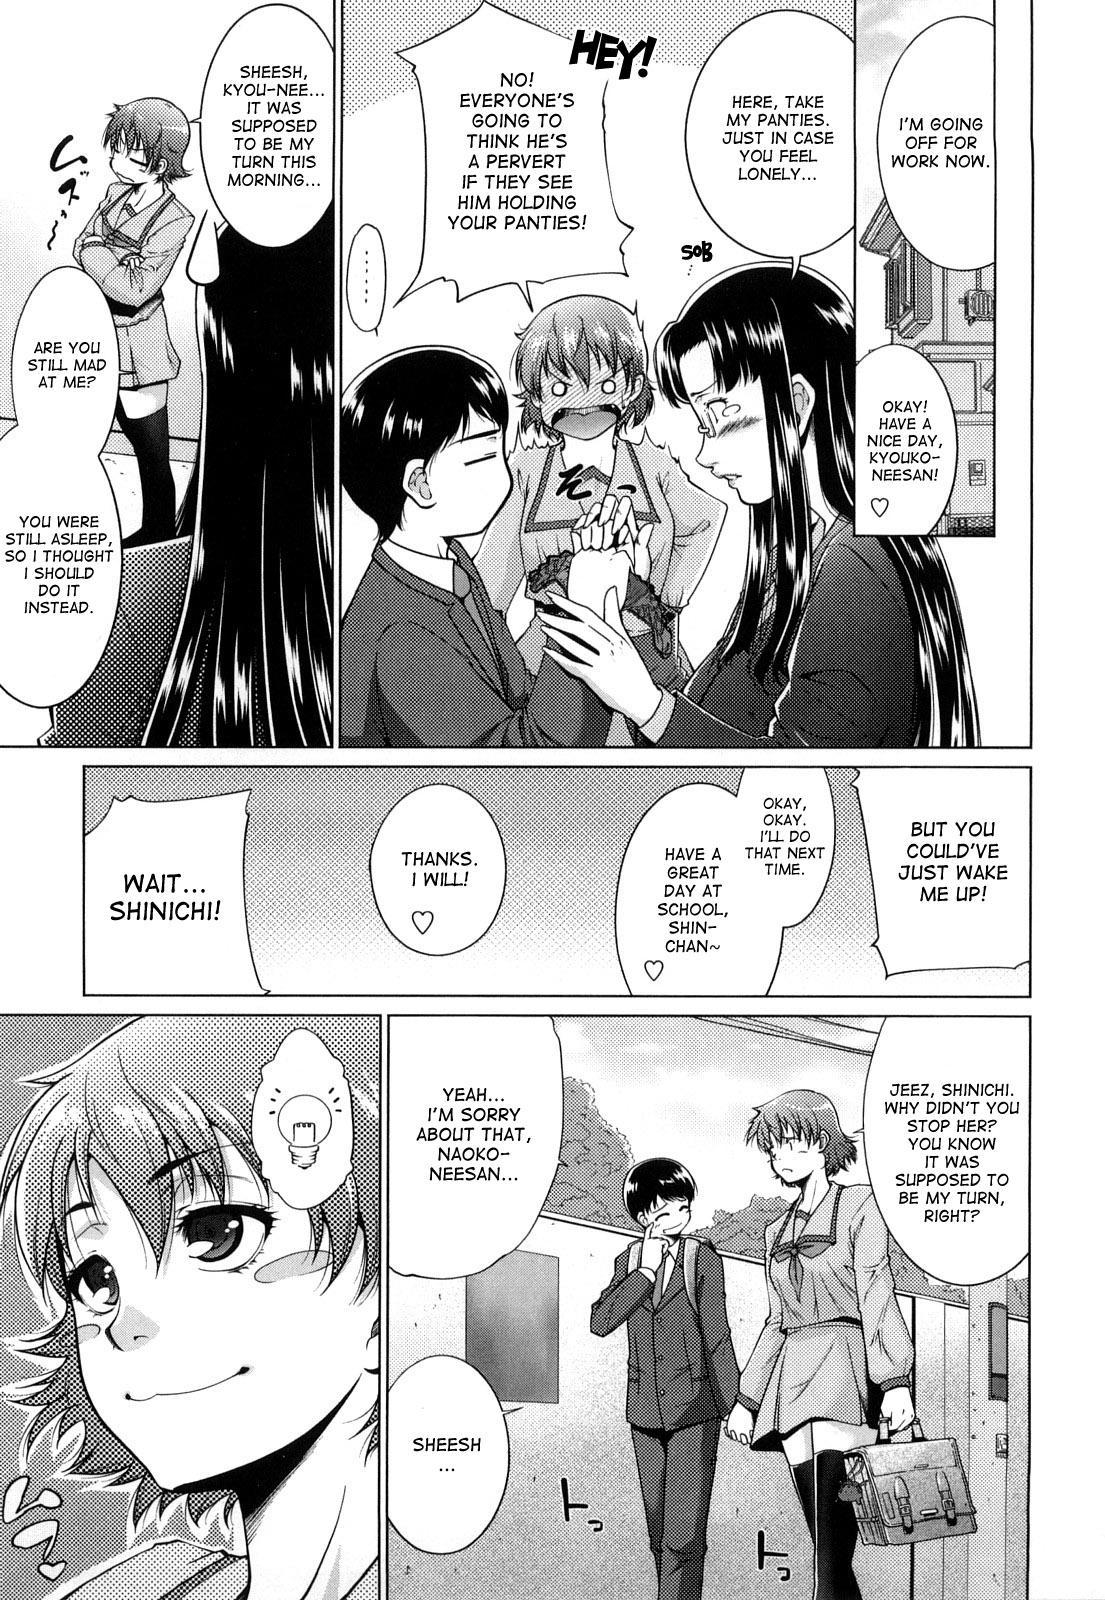 [Touma Itsuki] Ane-sama Inkou - Sister's Sexy Smell Ch. 1-6 [English] [desudesu] [Decensored] 70